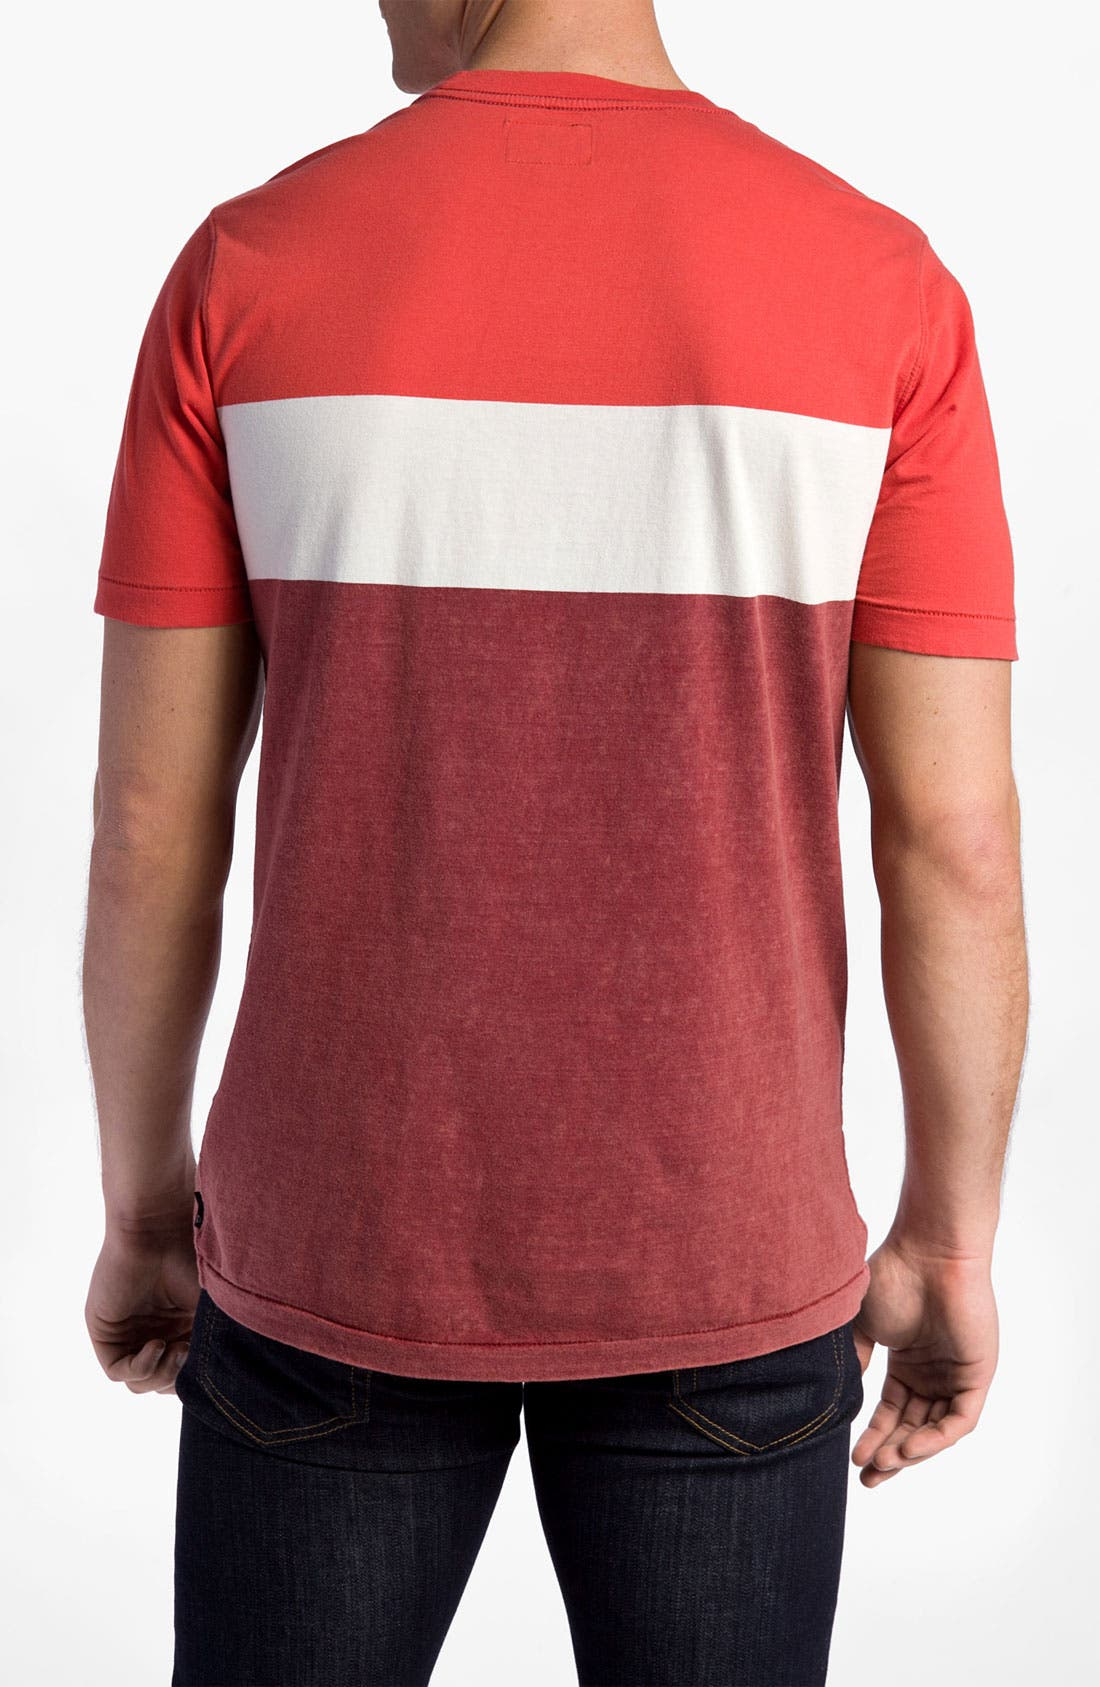 Alternate Image 2  - Quiksilver 'Friday' Colorblock Crewneck T-Shirt